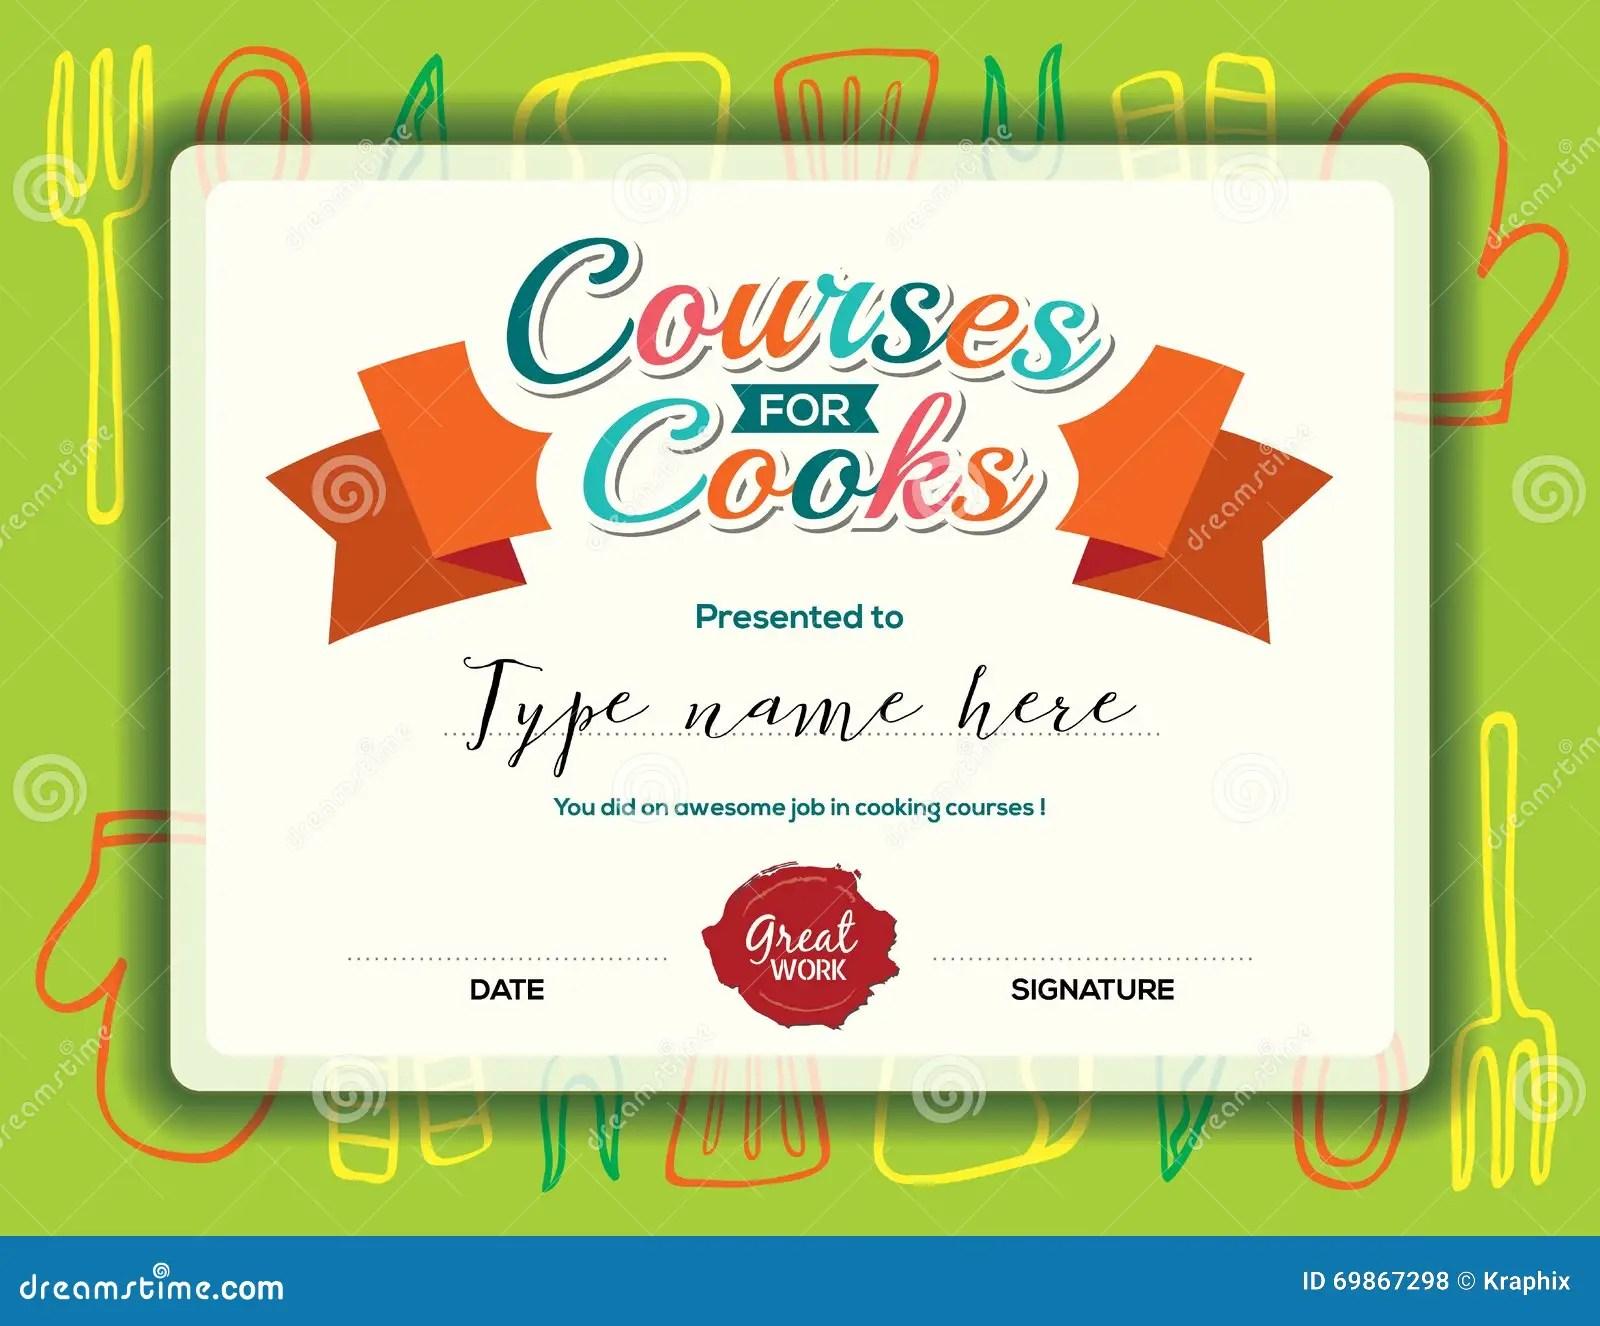 Kitchen Design Courses Certificate